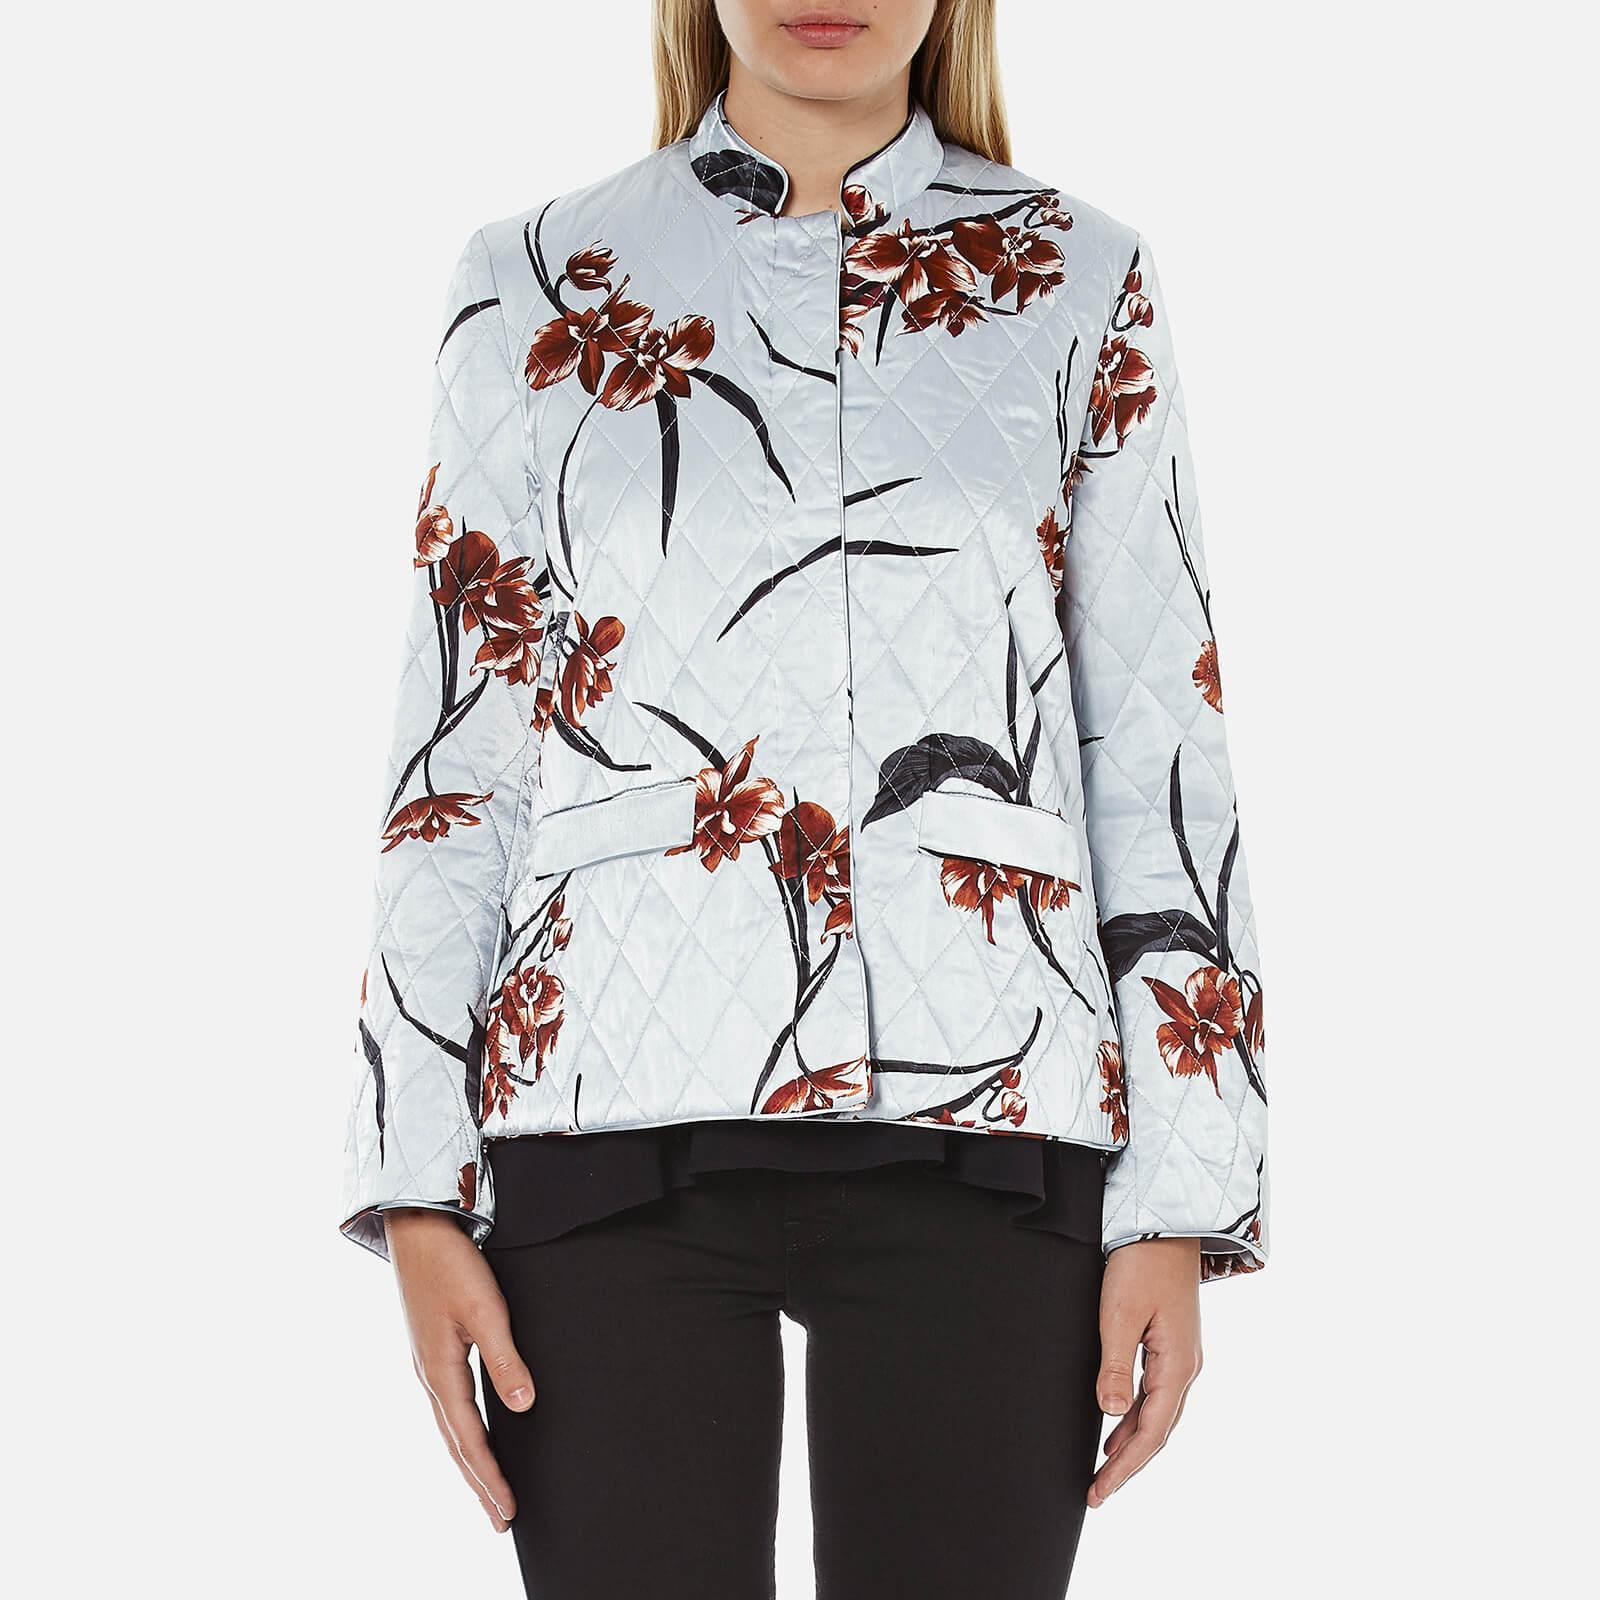 87a0d0f6c Ganni Women's Sanders Satin Jacket - Red Orchid